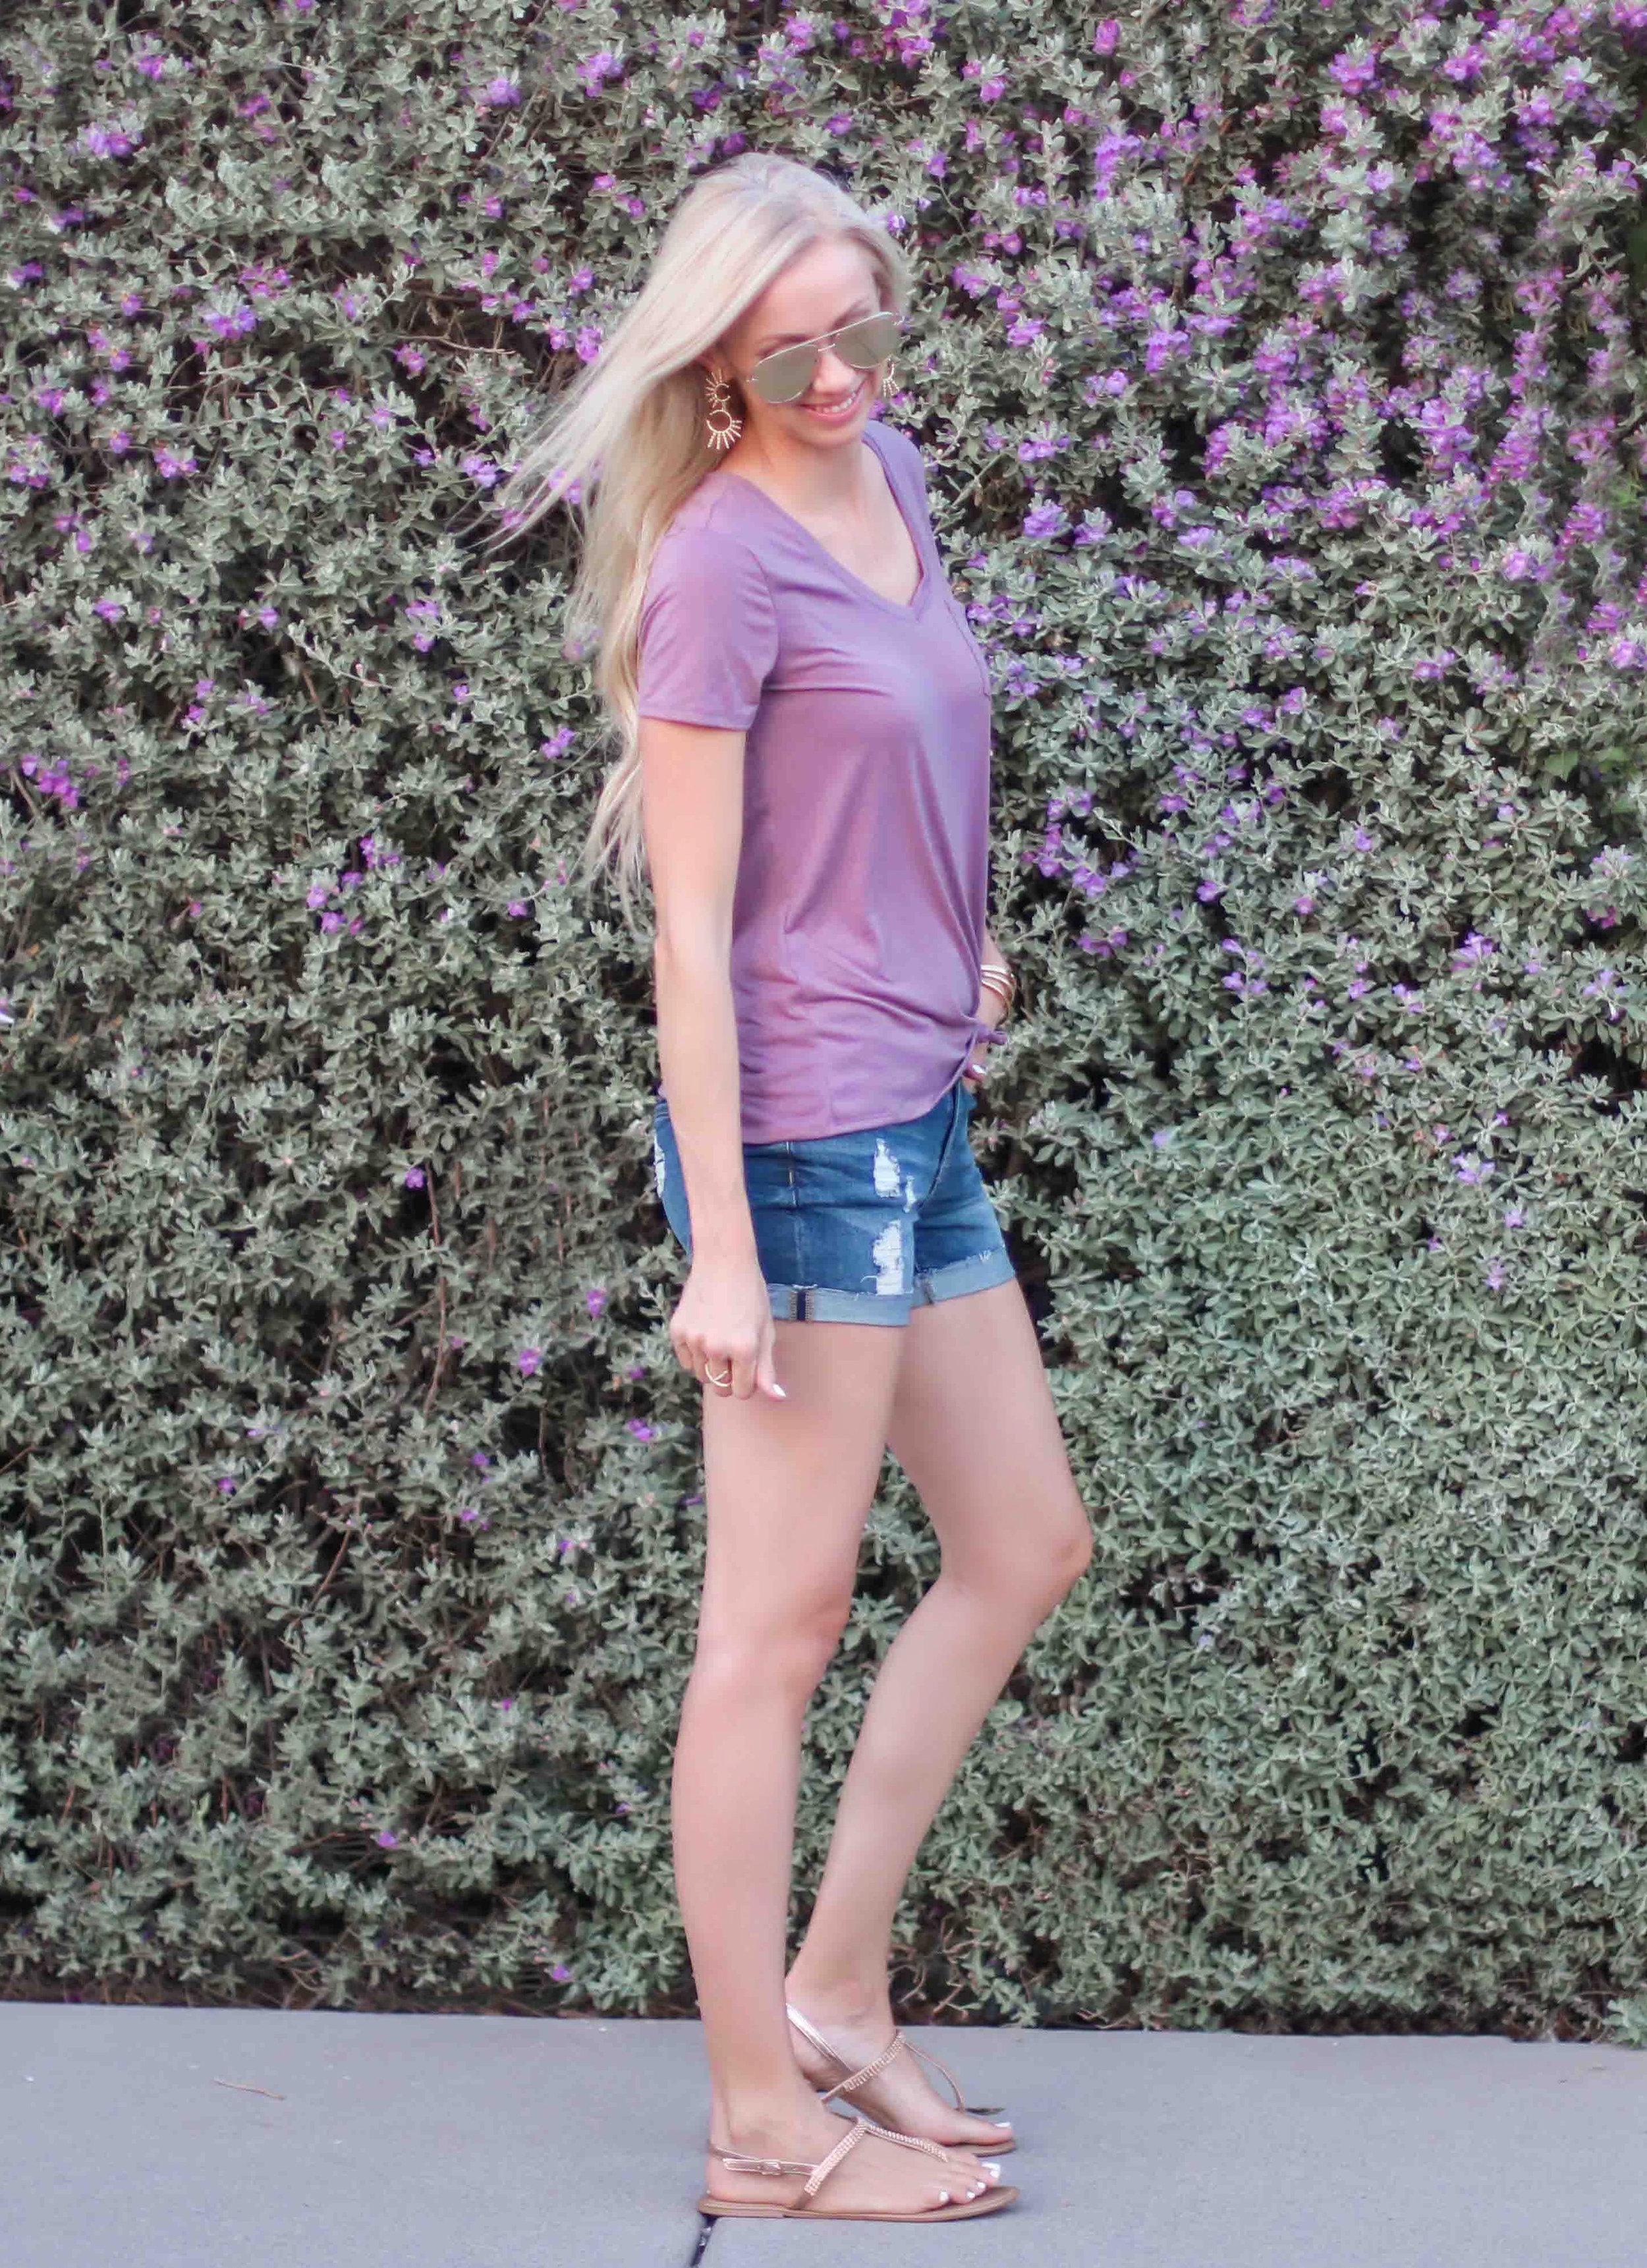 kohls-so-pocket-tee-tie-front-knot-purple-fall-fashion.jpg